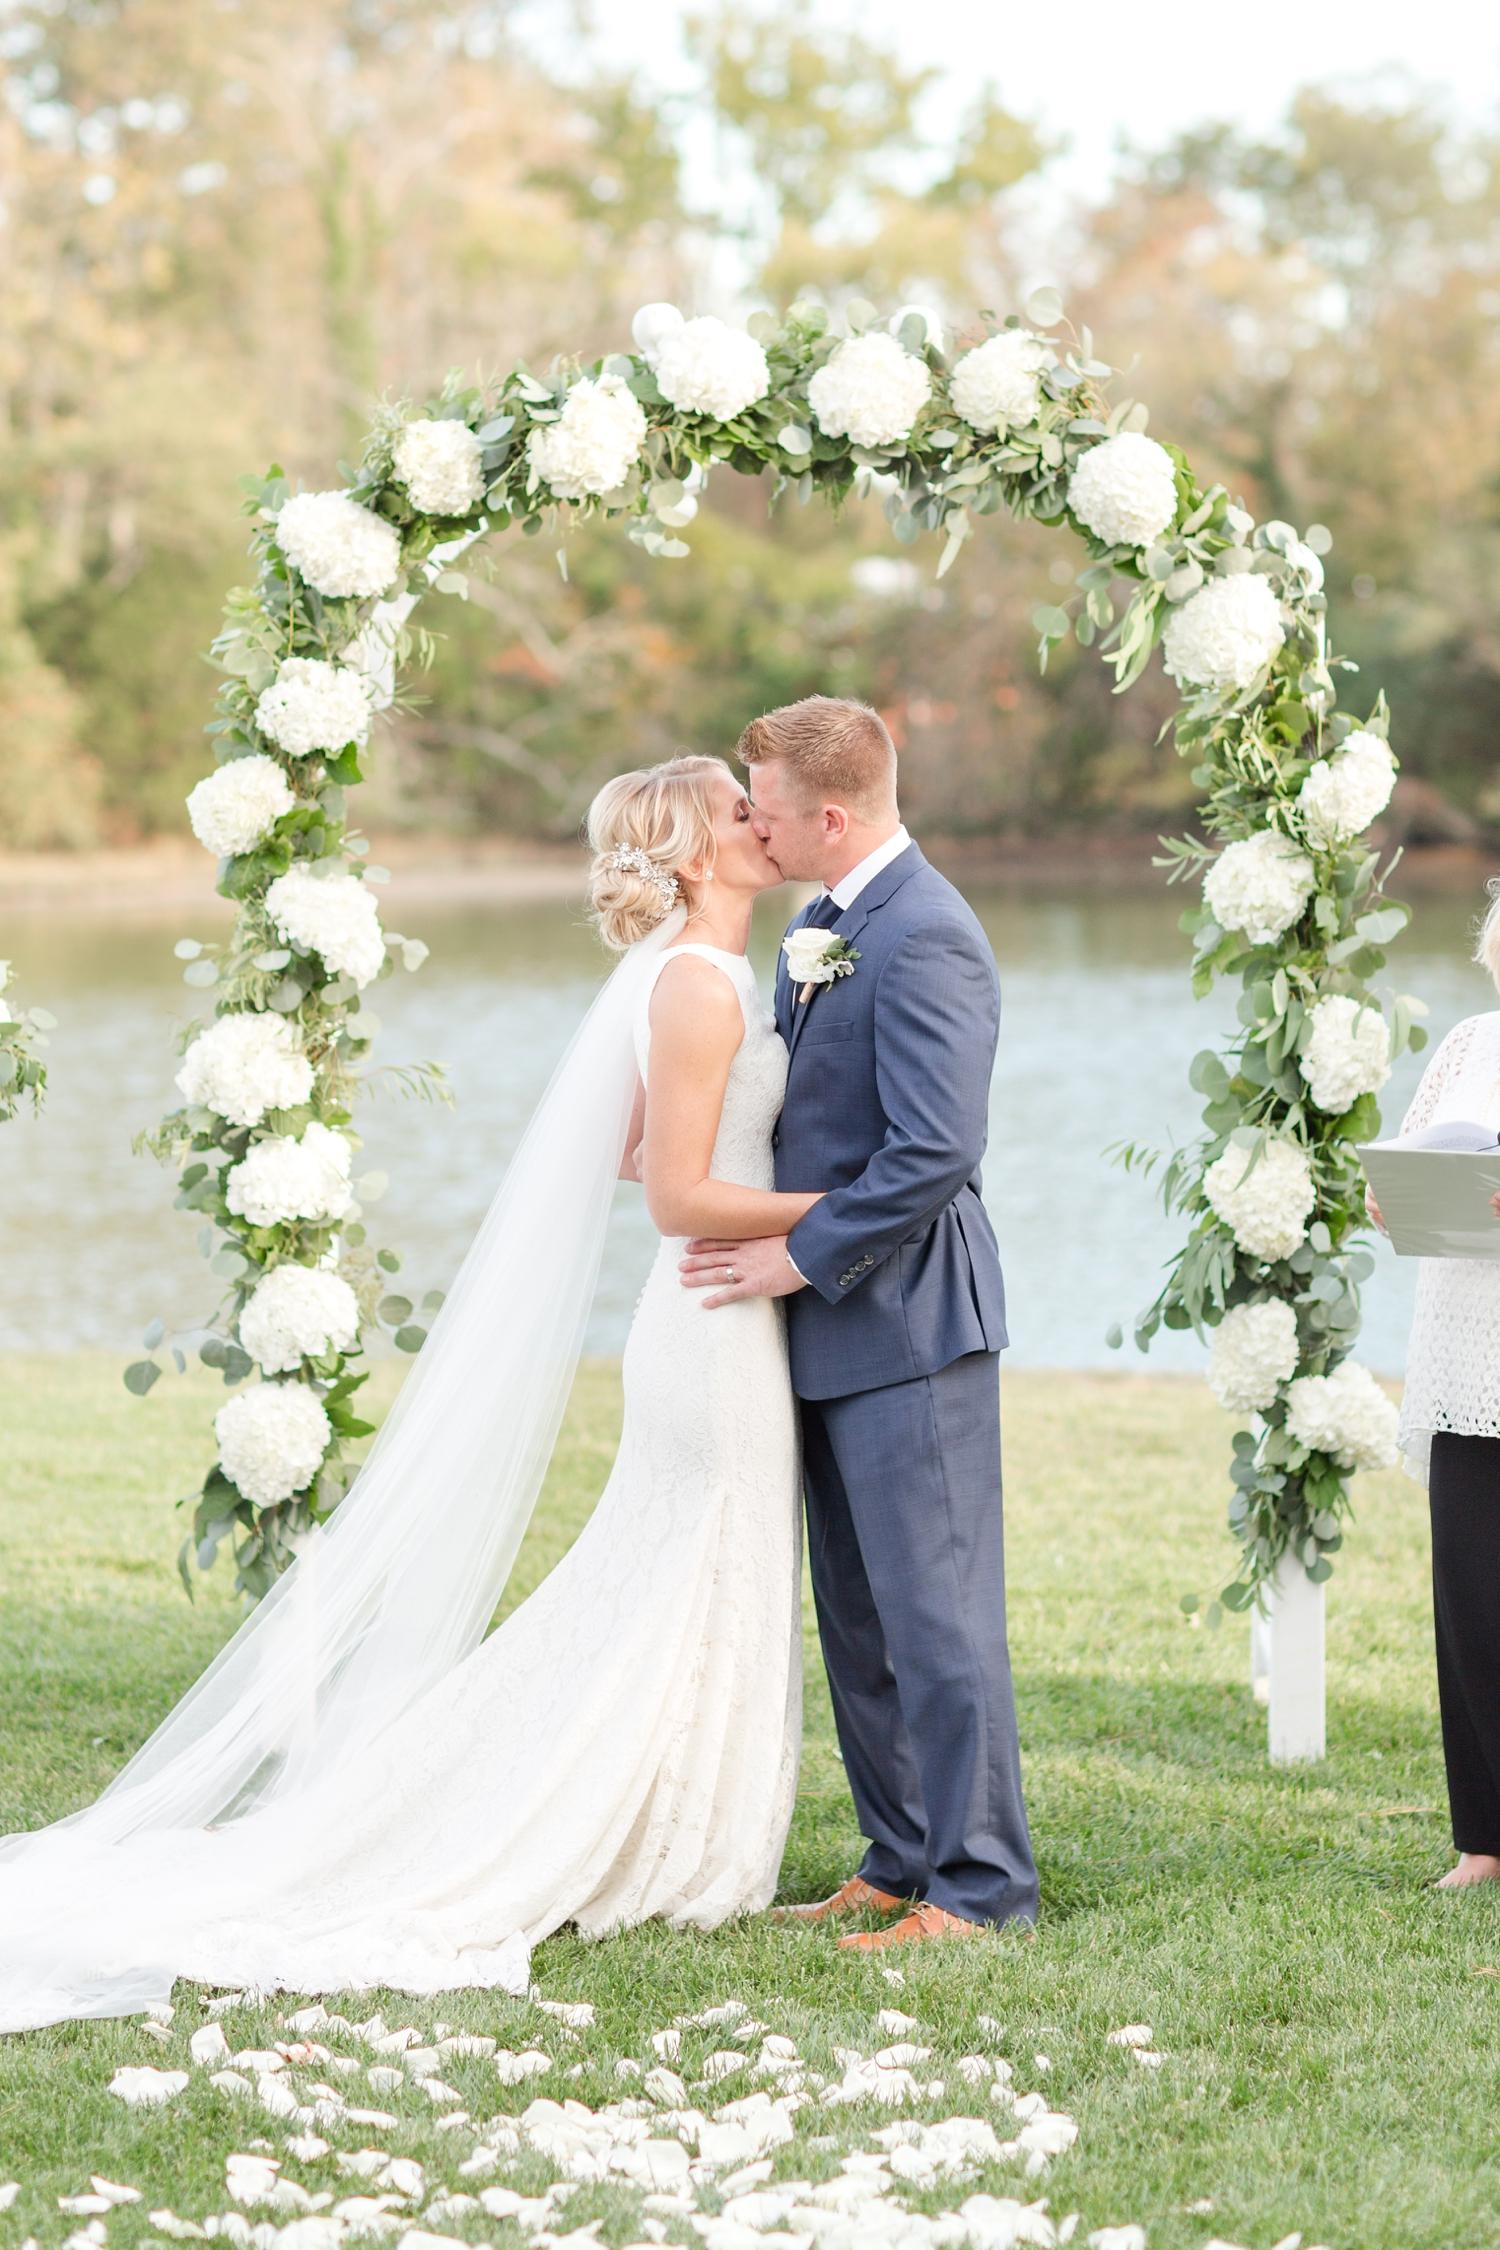 Wojciechowski Wedding-350_the-oaks-waterfront-inn-wedding-easton-maryland-wedding-photography-anna-grace-photography-photo.jpg